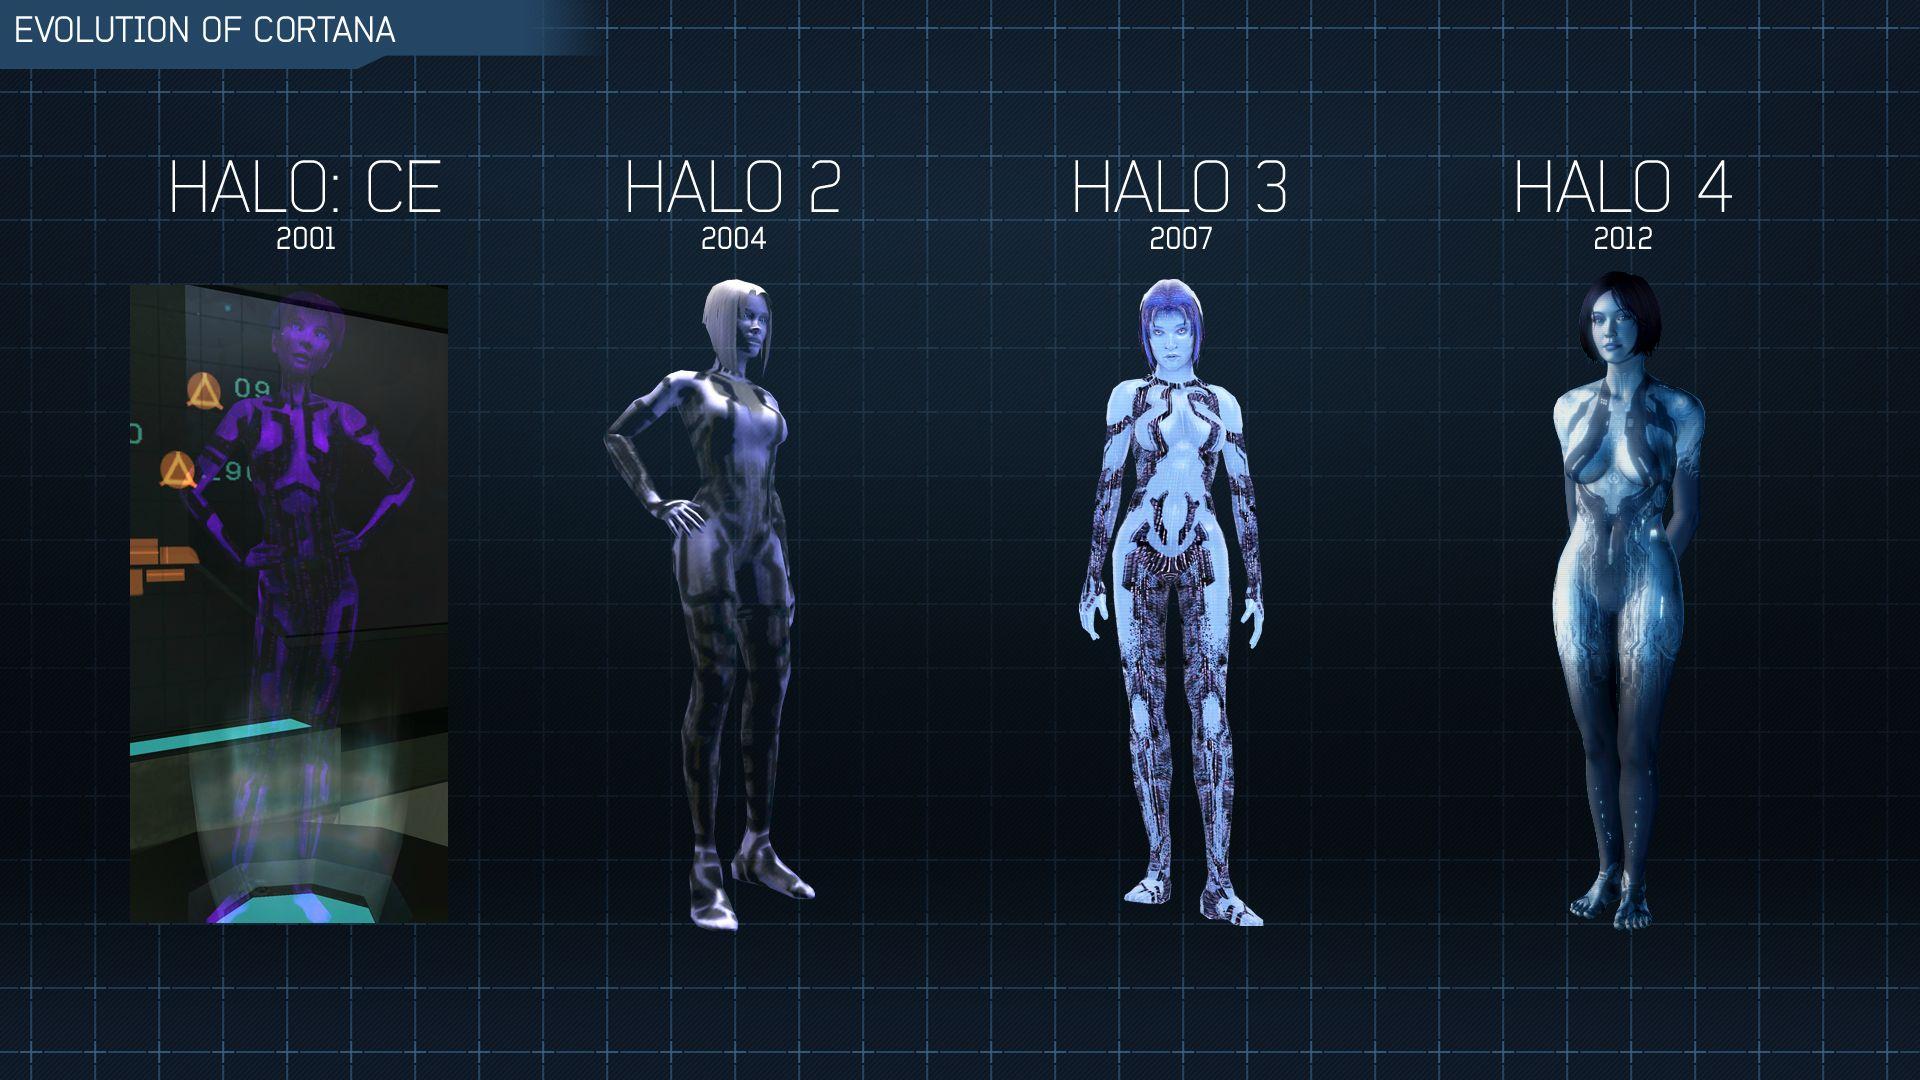 Halo 2 cortana nude erotic images